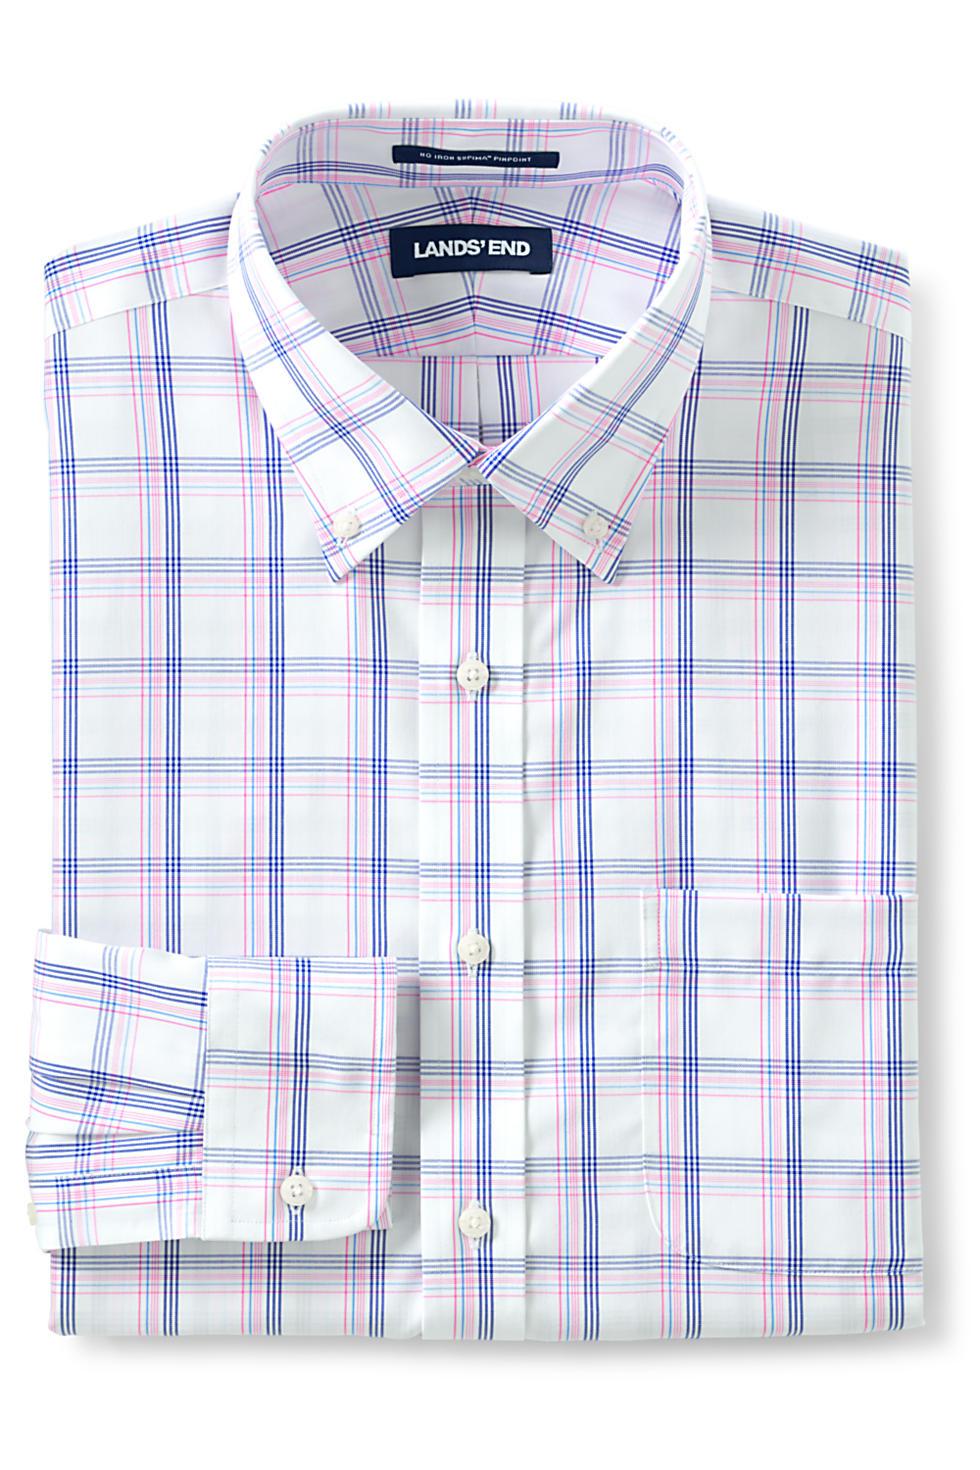 Lands' End Men's Traditional Fit Button-Down Collar Dress Shirt